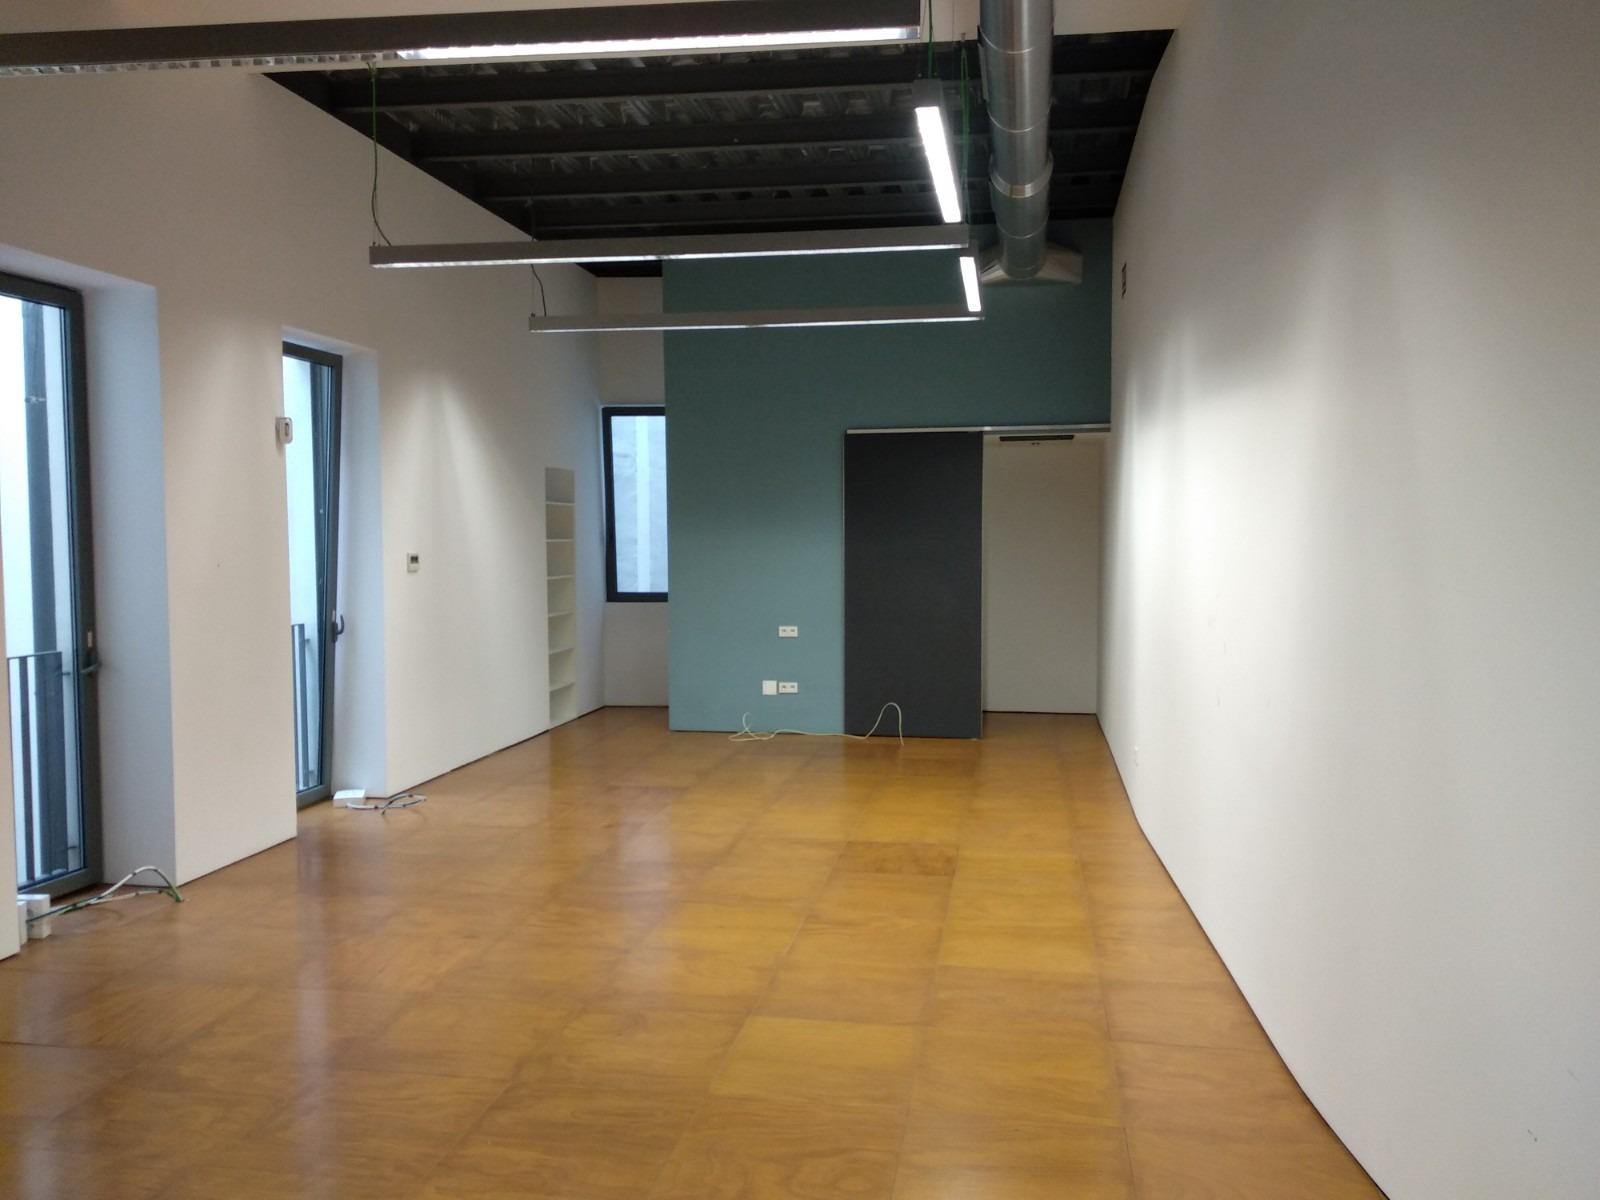 Oficina buen estado en alquiler en Murcia, San Lorenzo - La Merced